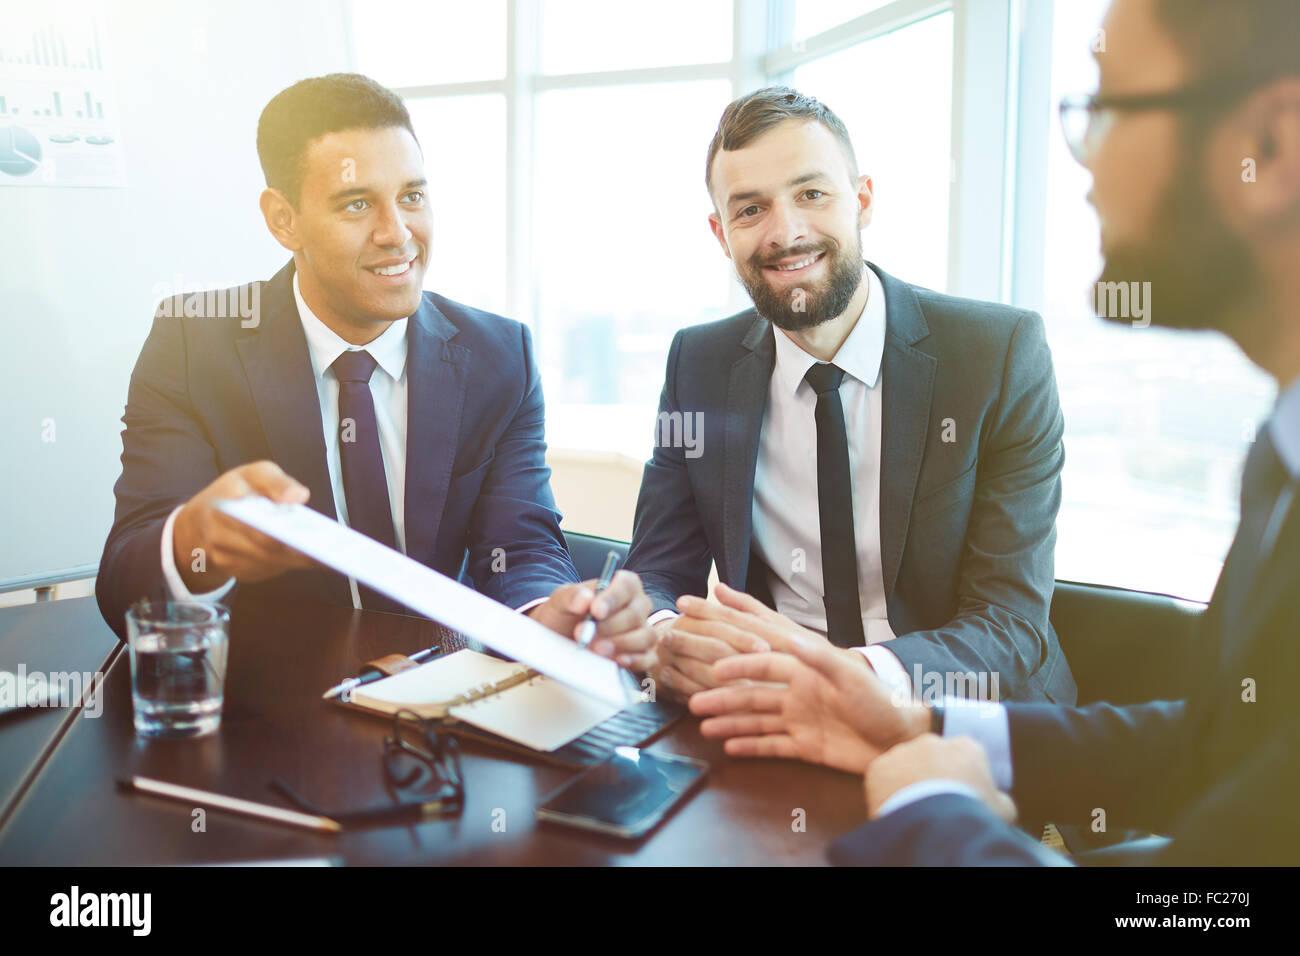 Successful businessmen striking deal after negotiation - Stock Image